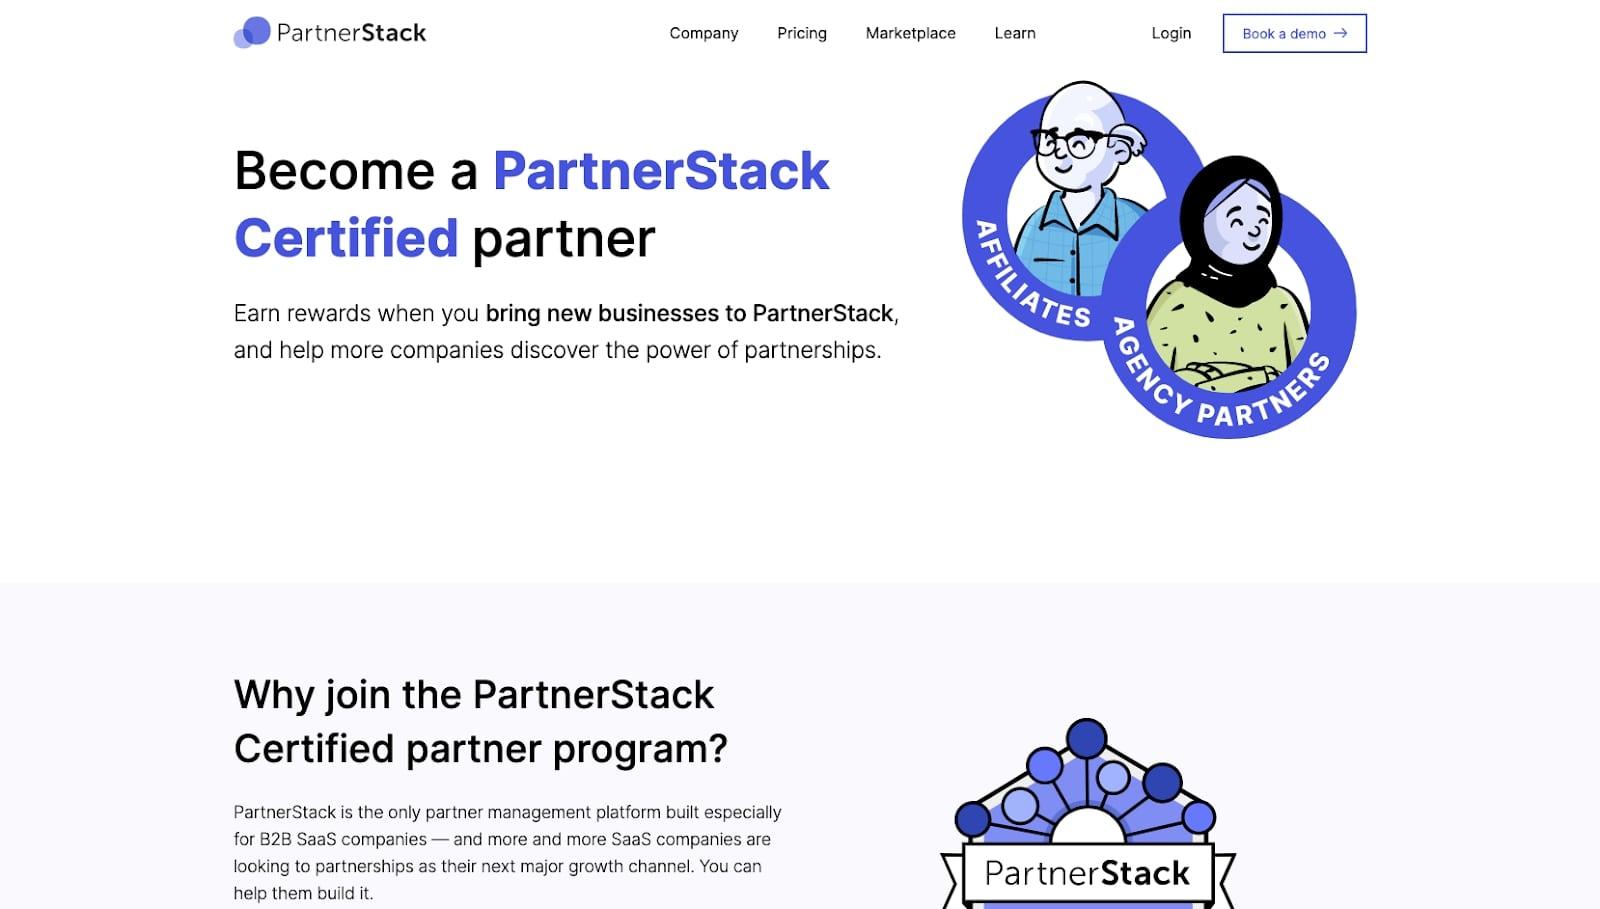 Screenshot of PartnerStack affiliate program website